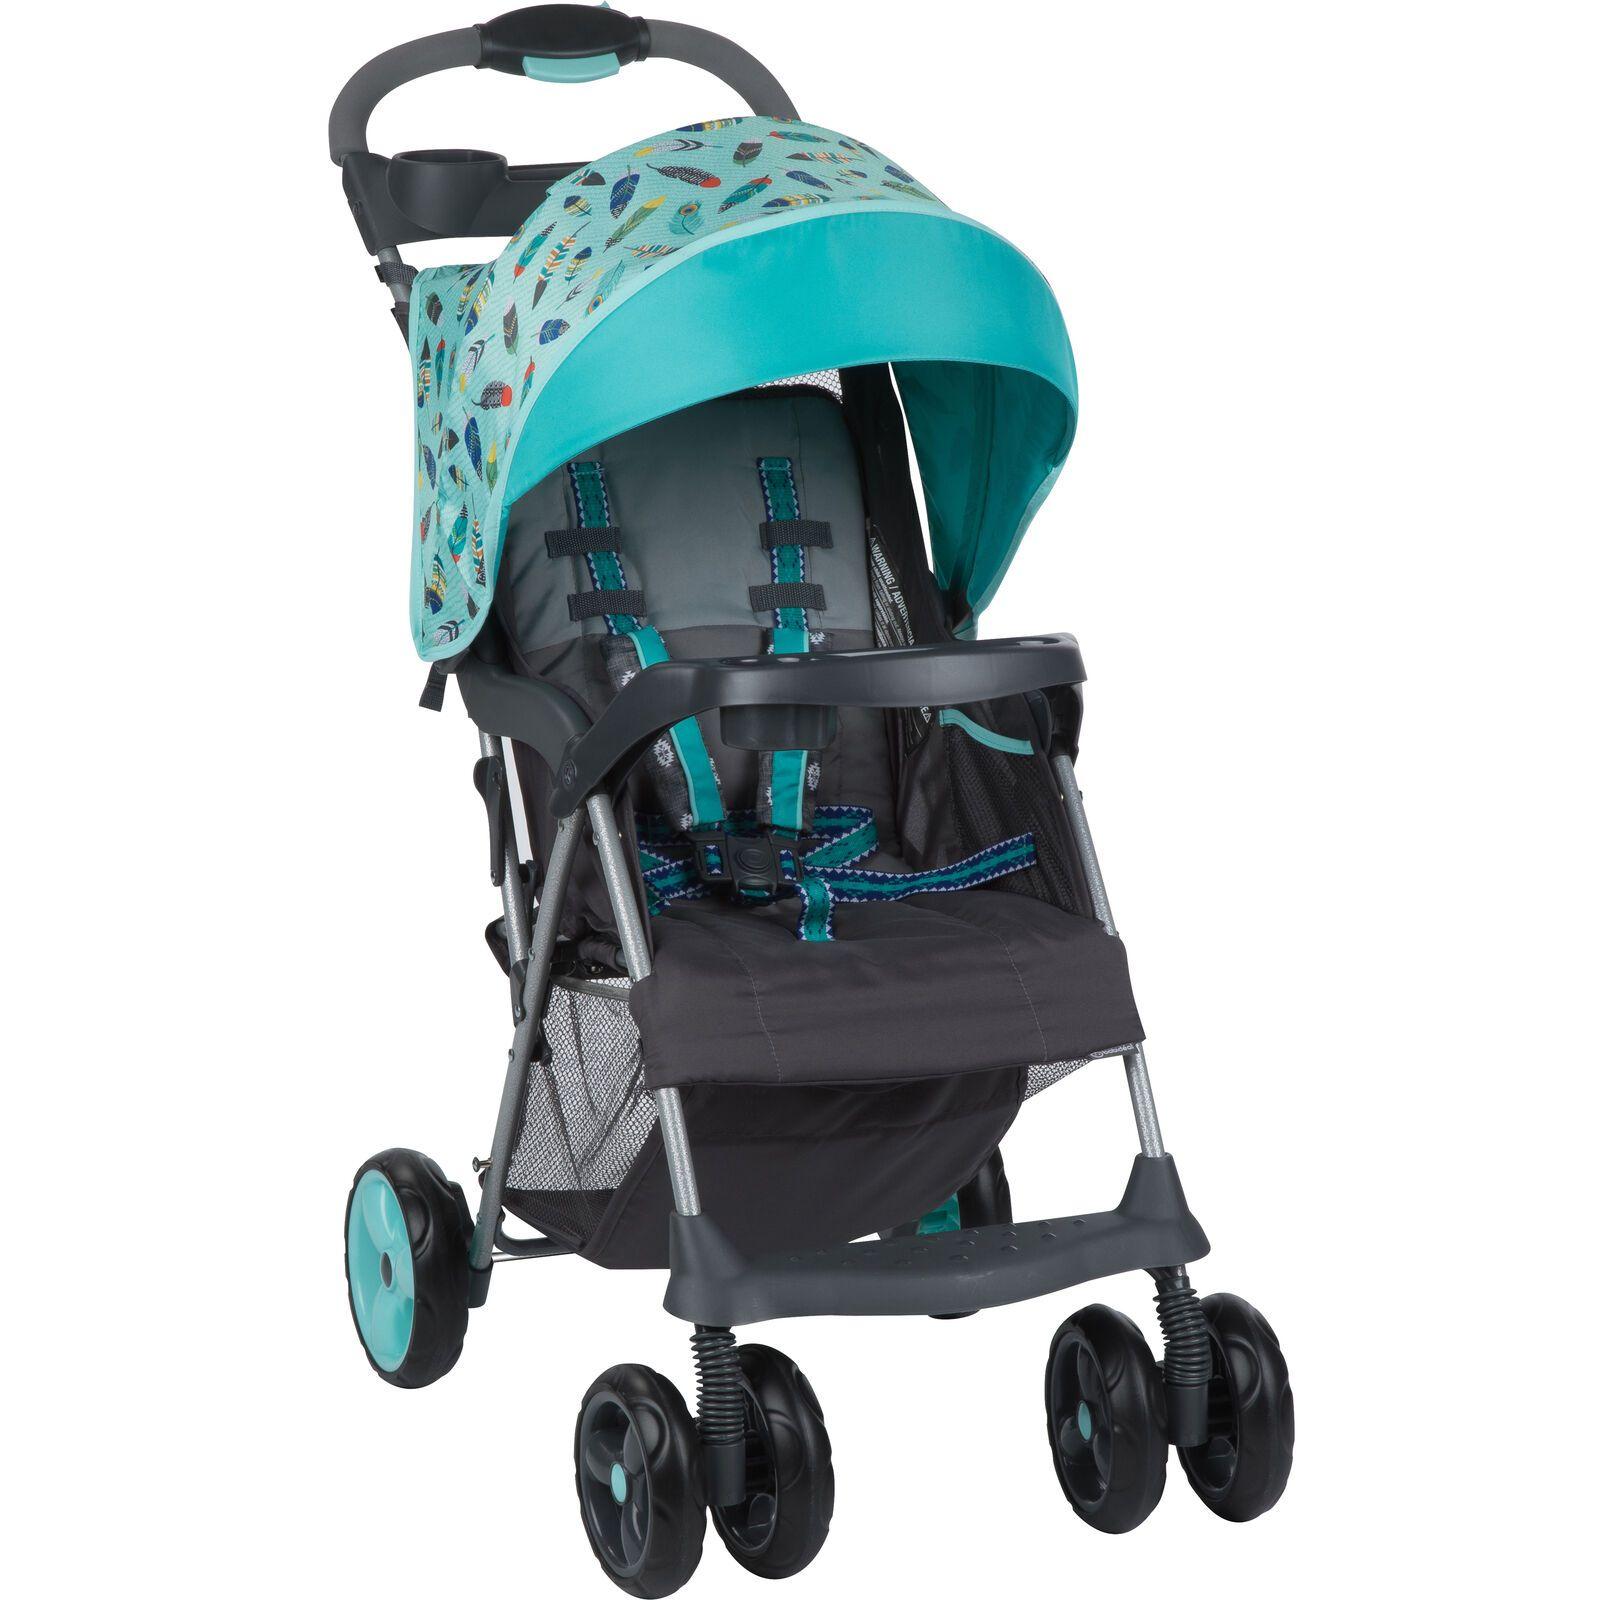 Umbrella Stroller Lightweight Travel Toddler Baby Folding